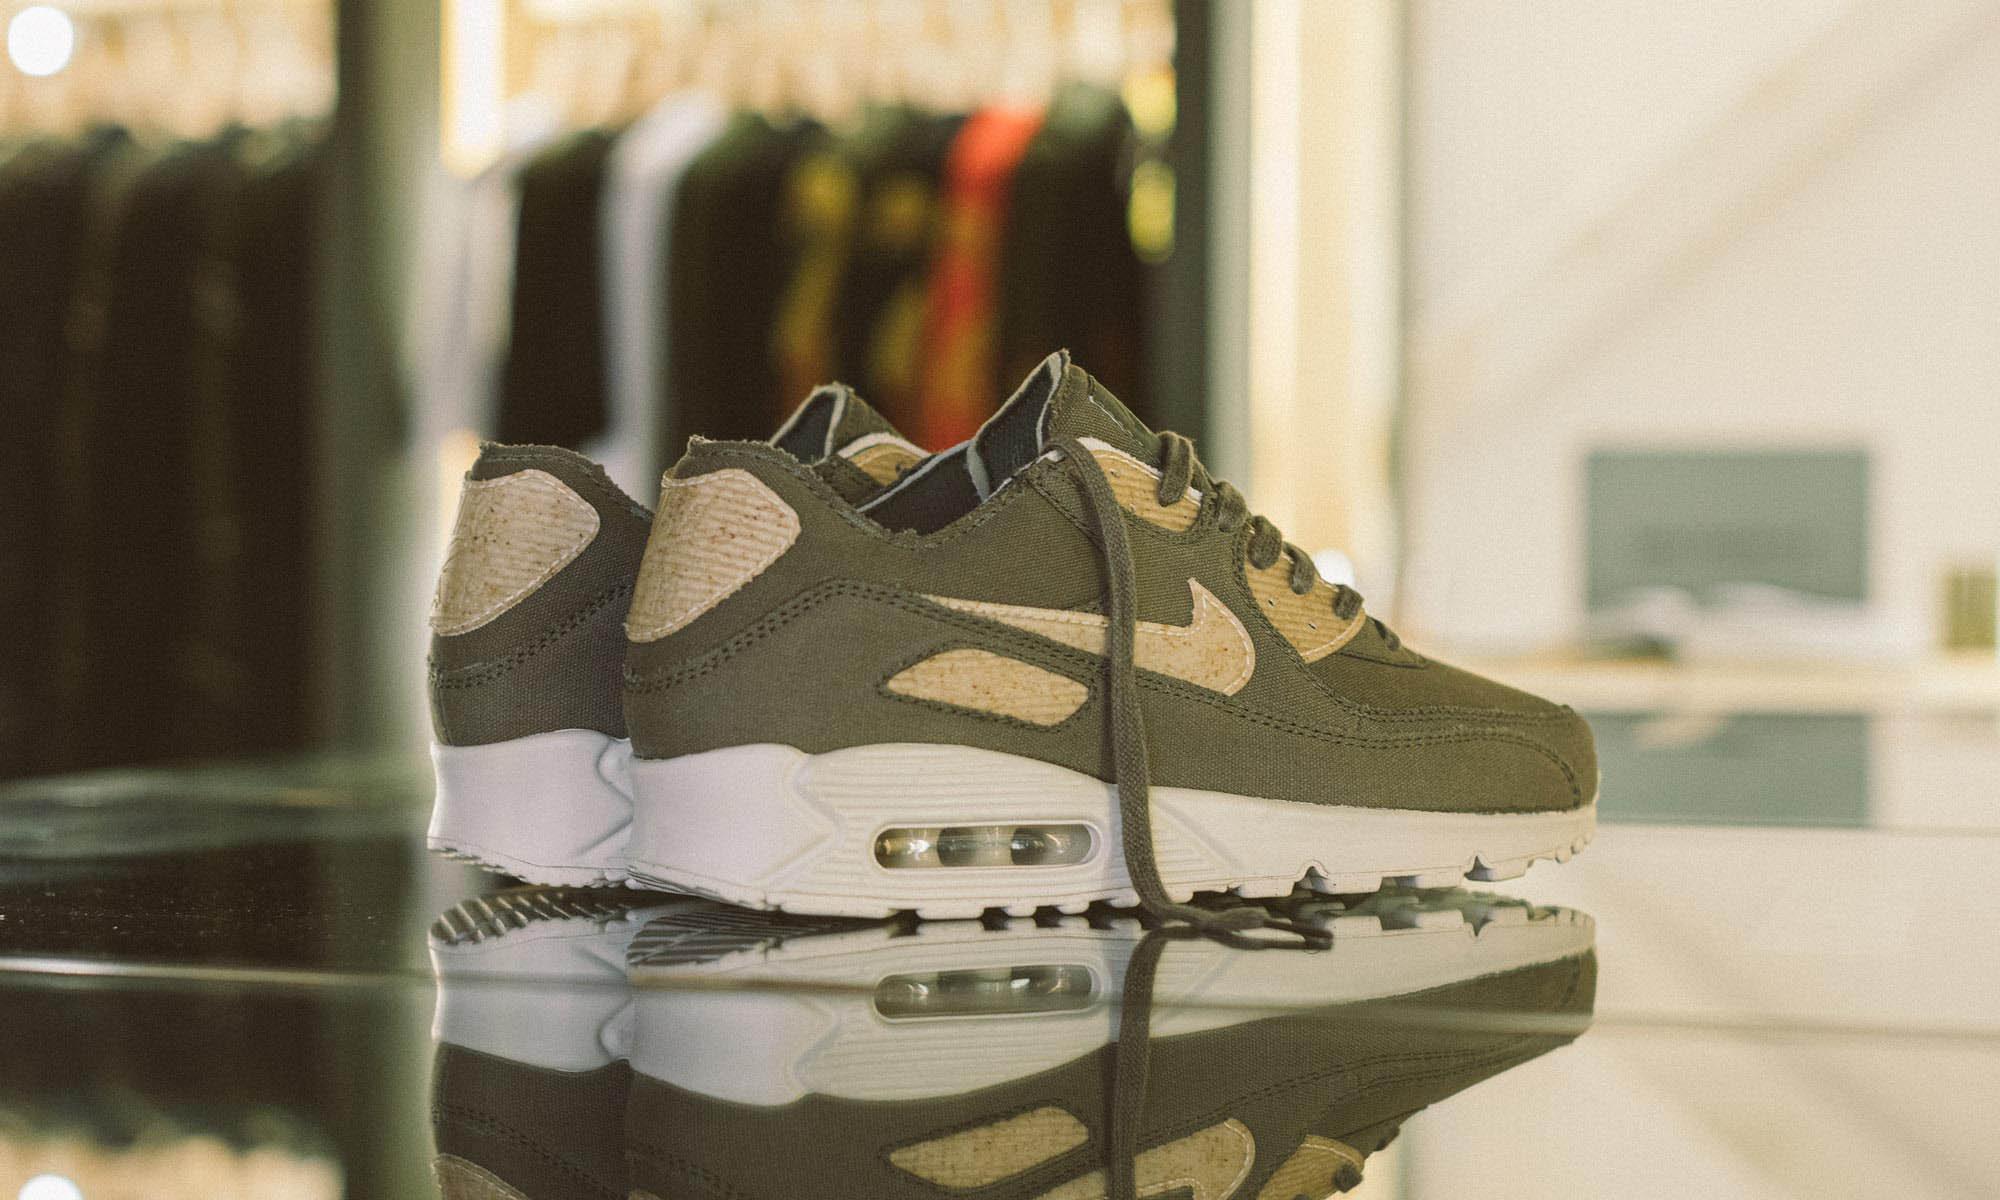 庆祝旗舰店开业,maharishi 与 Nike 推出限量版 Air Max 90